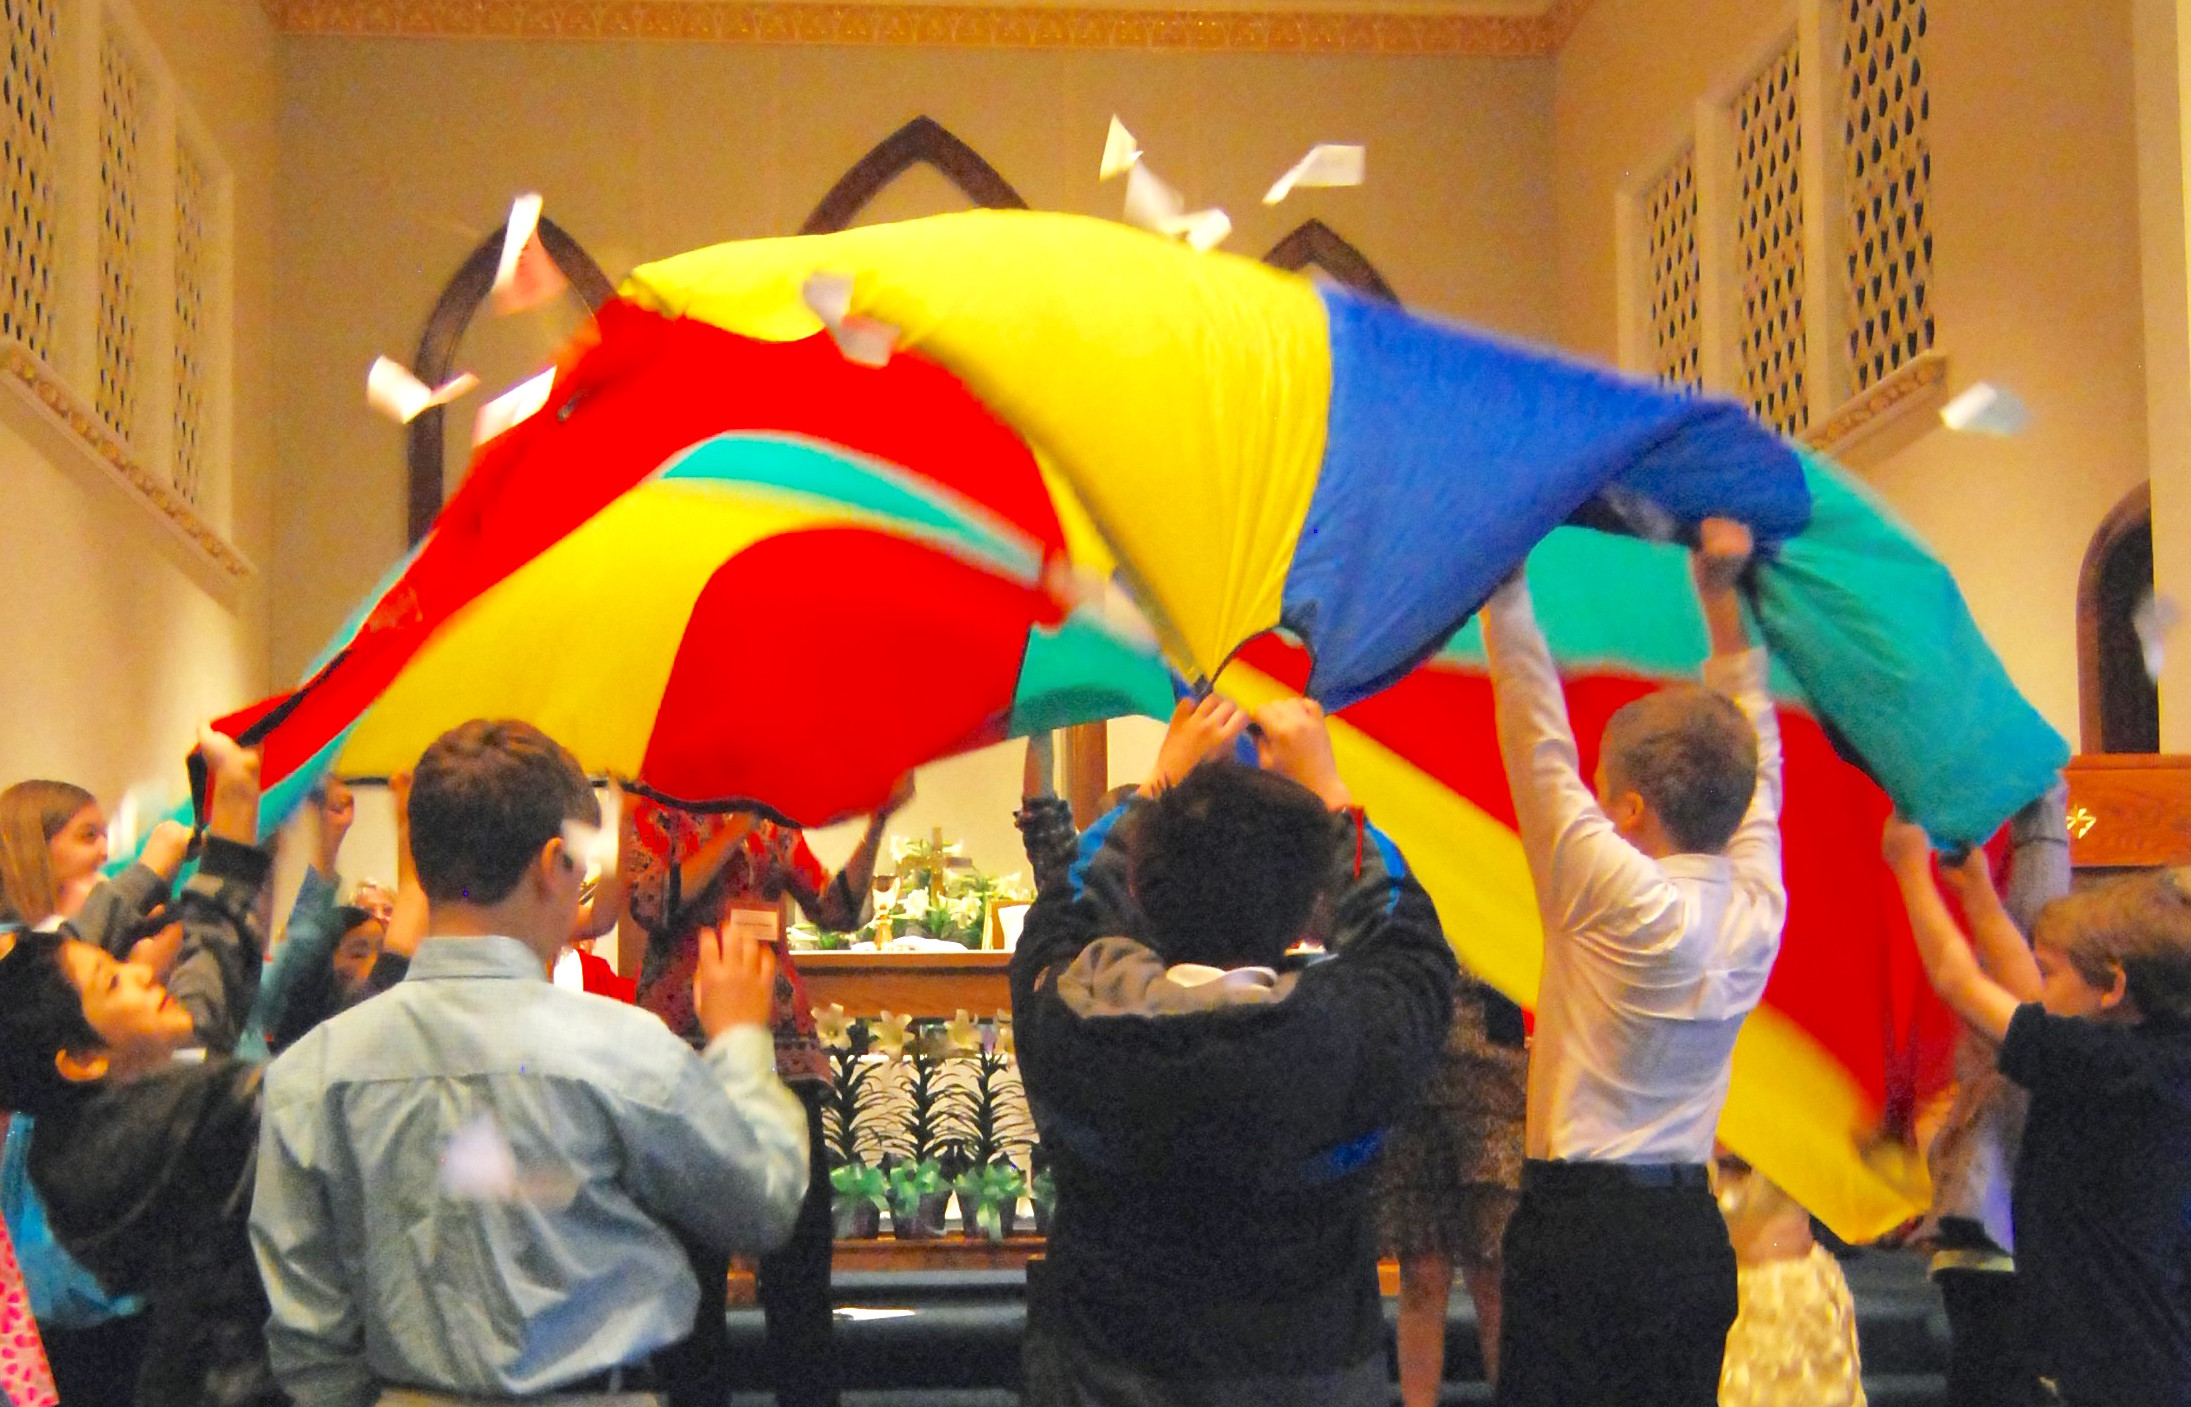 teach bible stories with a parachute